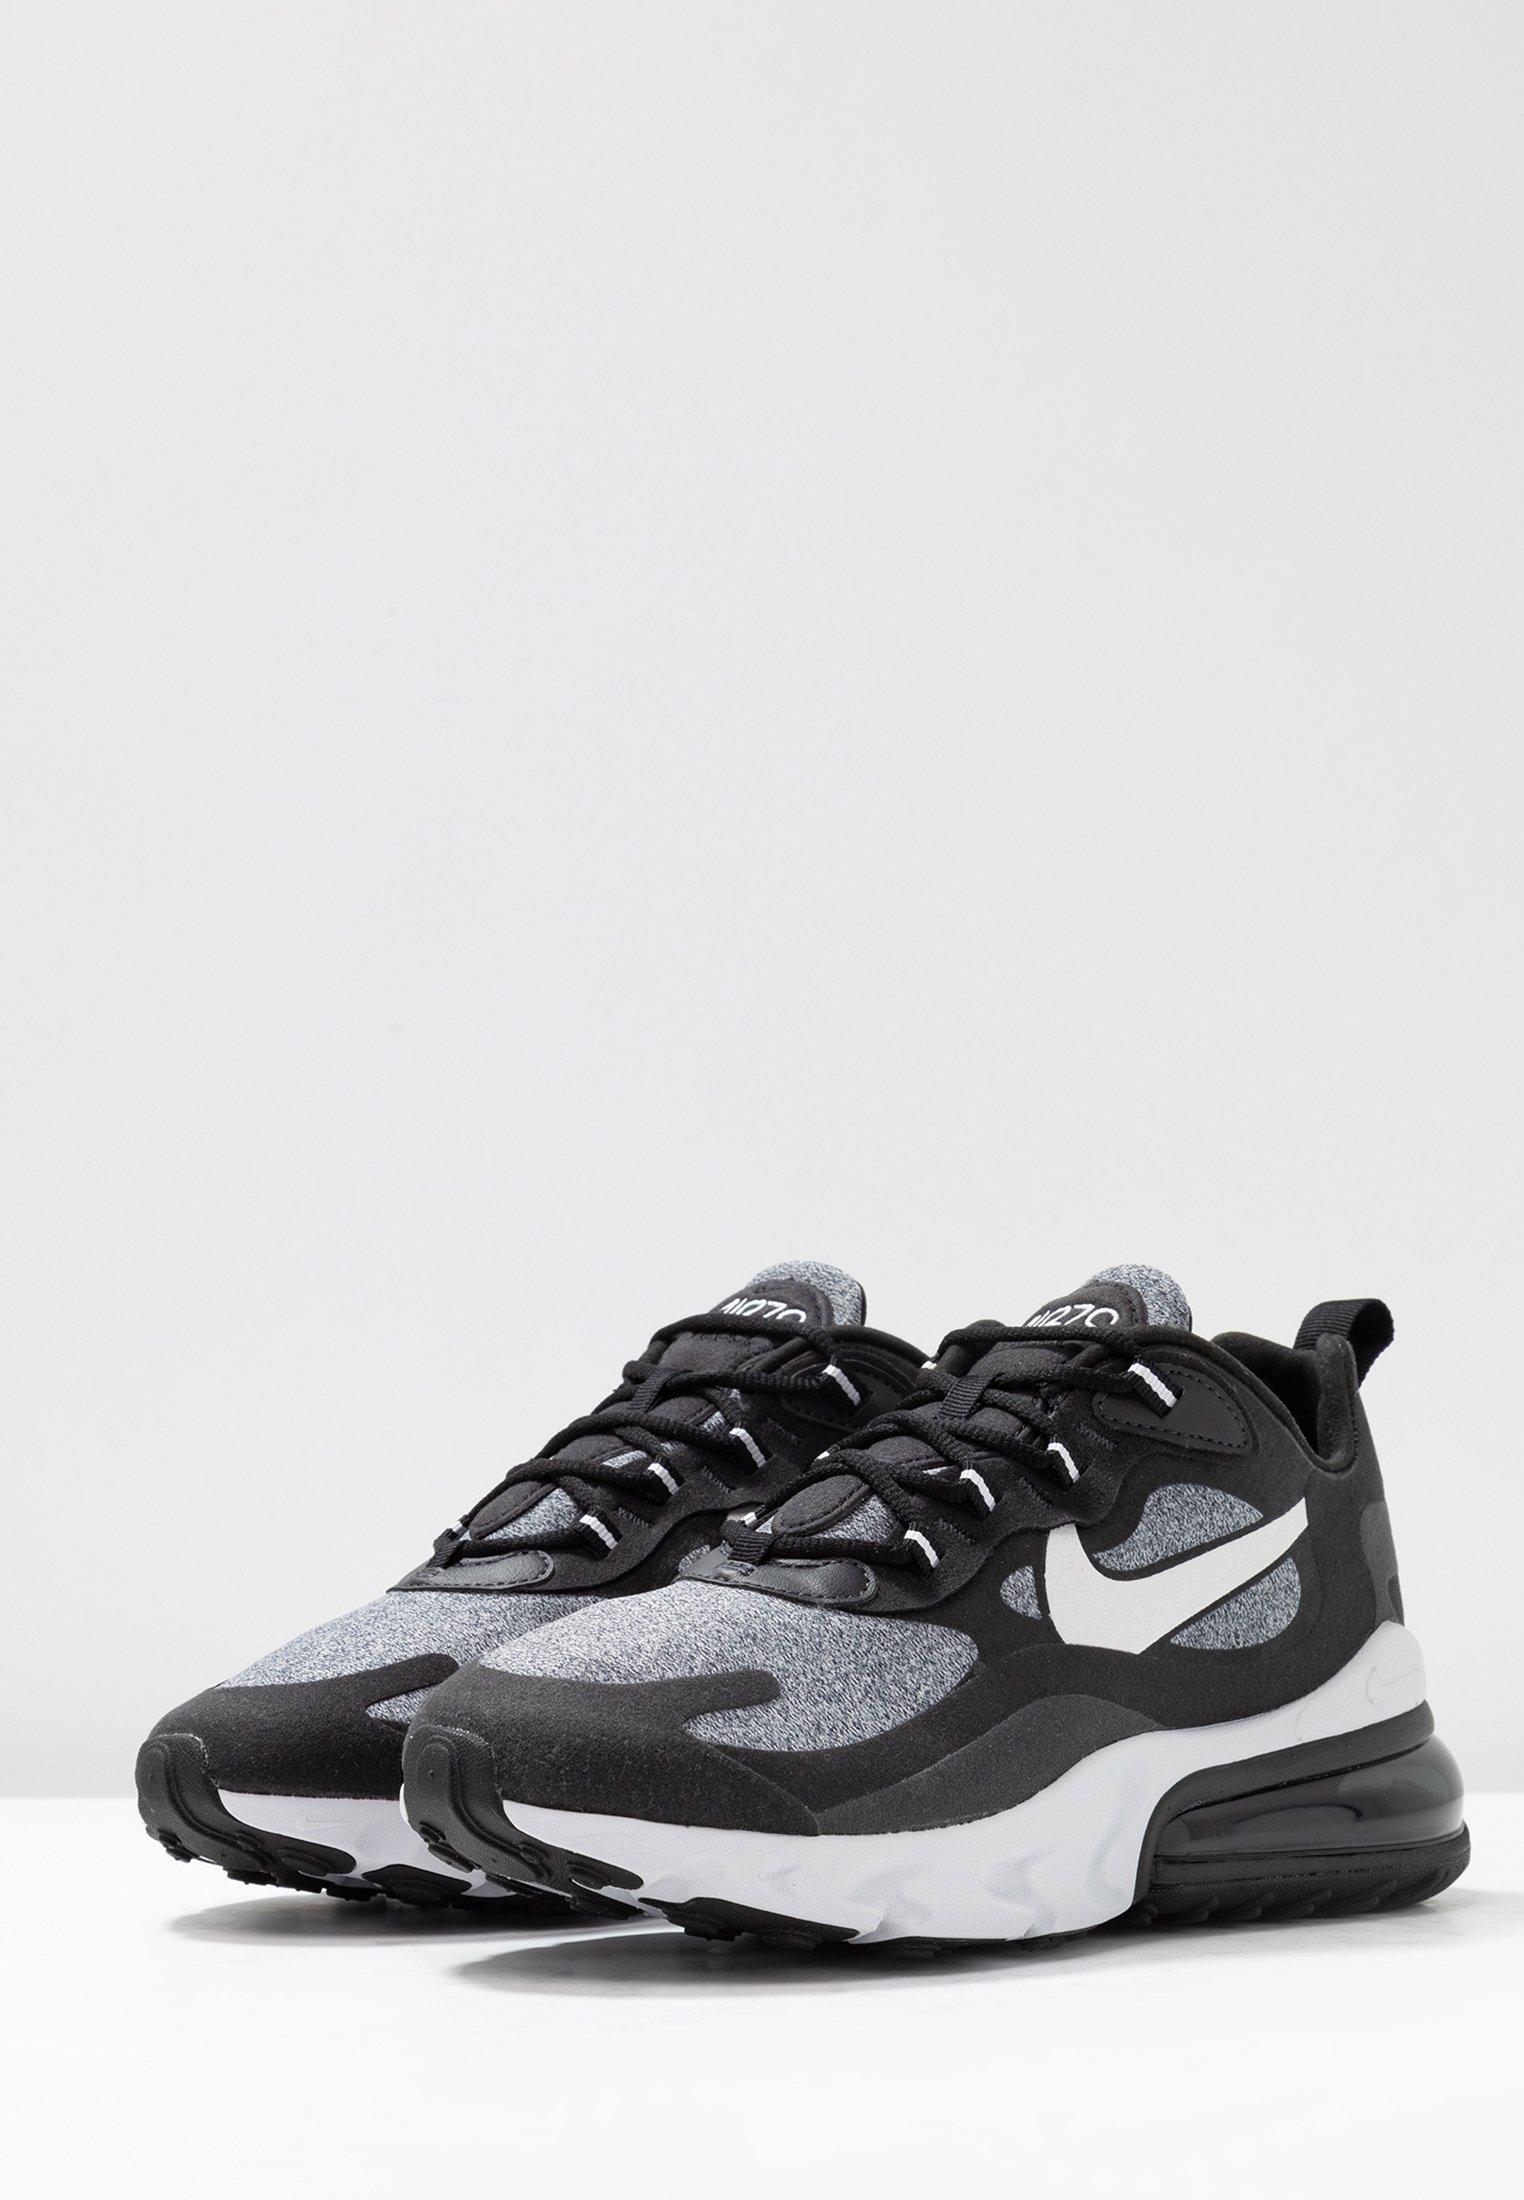 Black Grey vast Nike Noir ReactBaskets Max Sportswear Air Basses 270 off u1J3cTlK5F